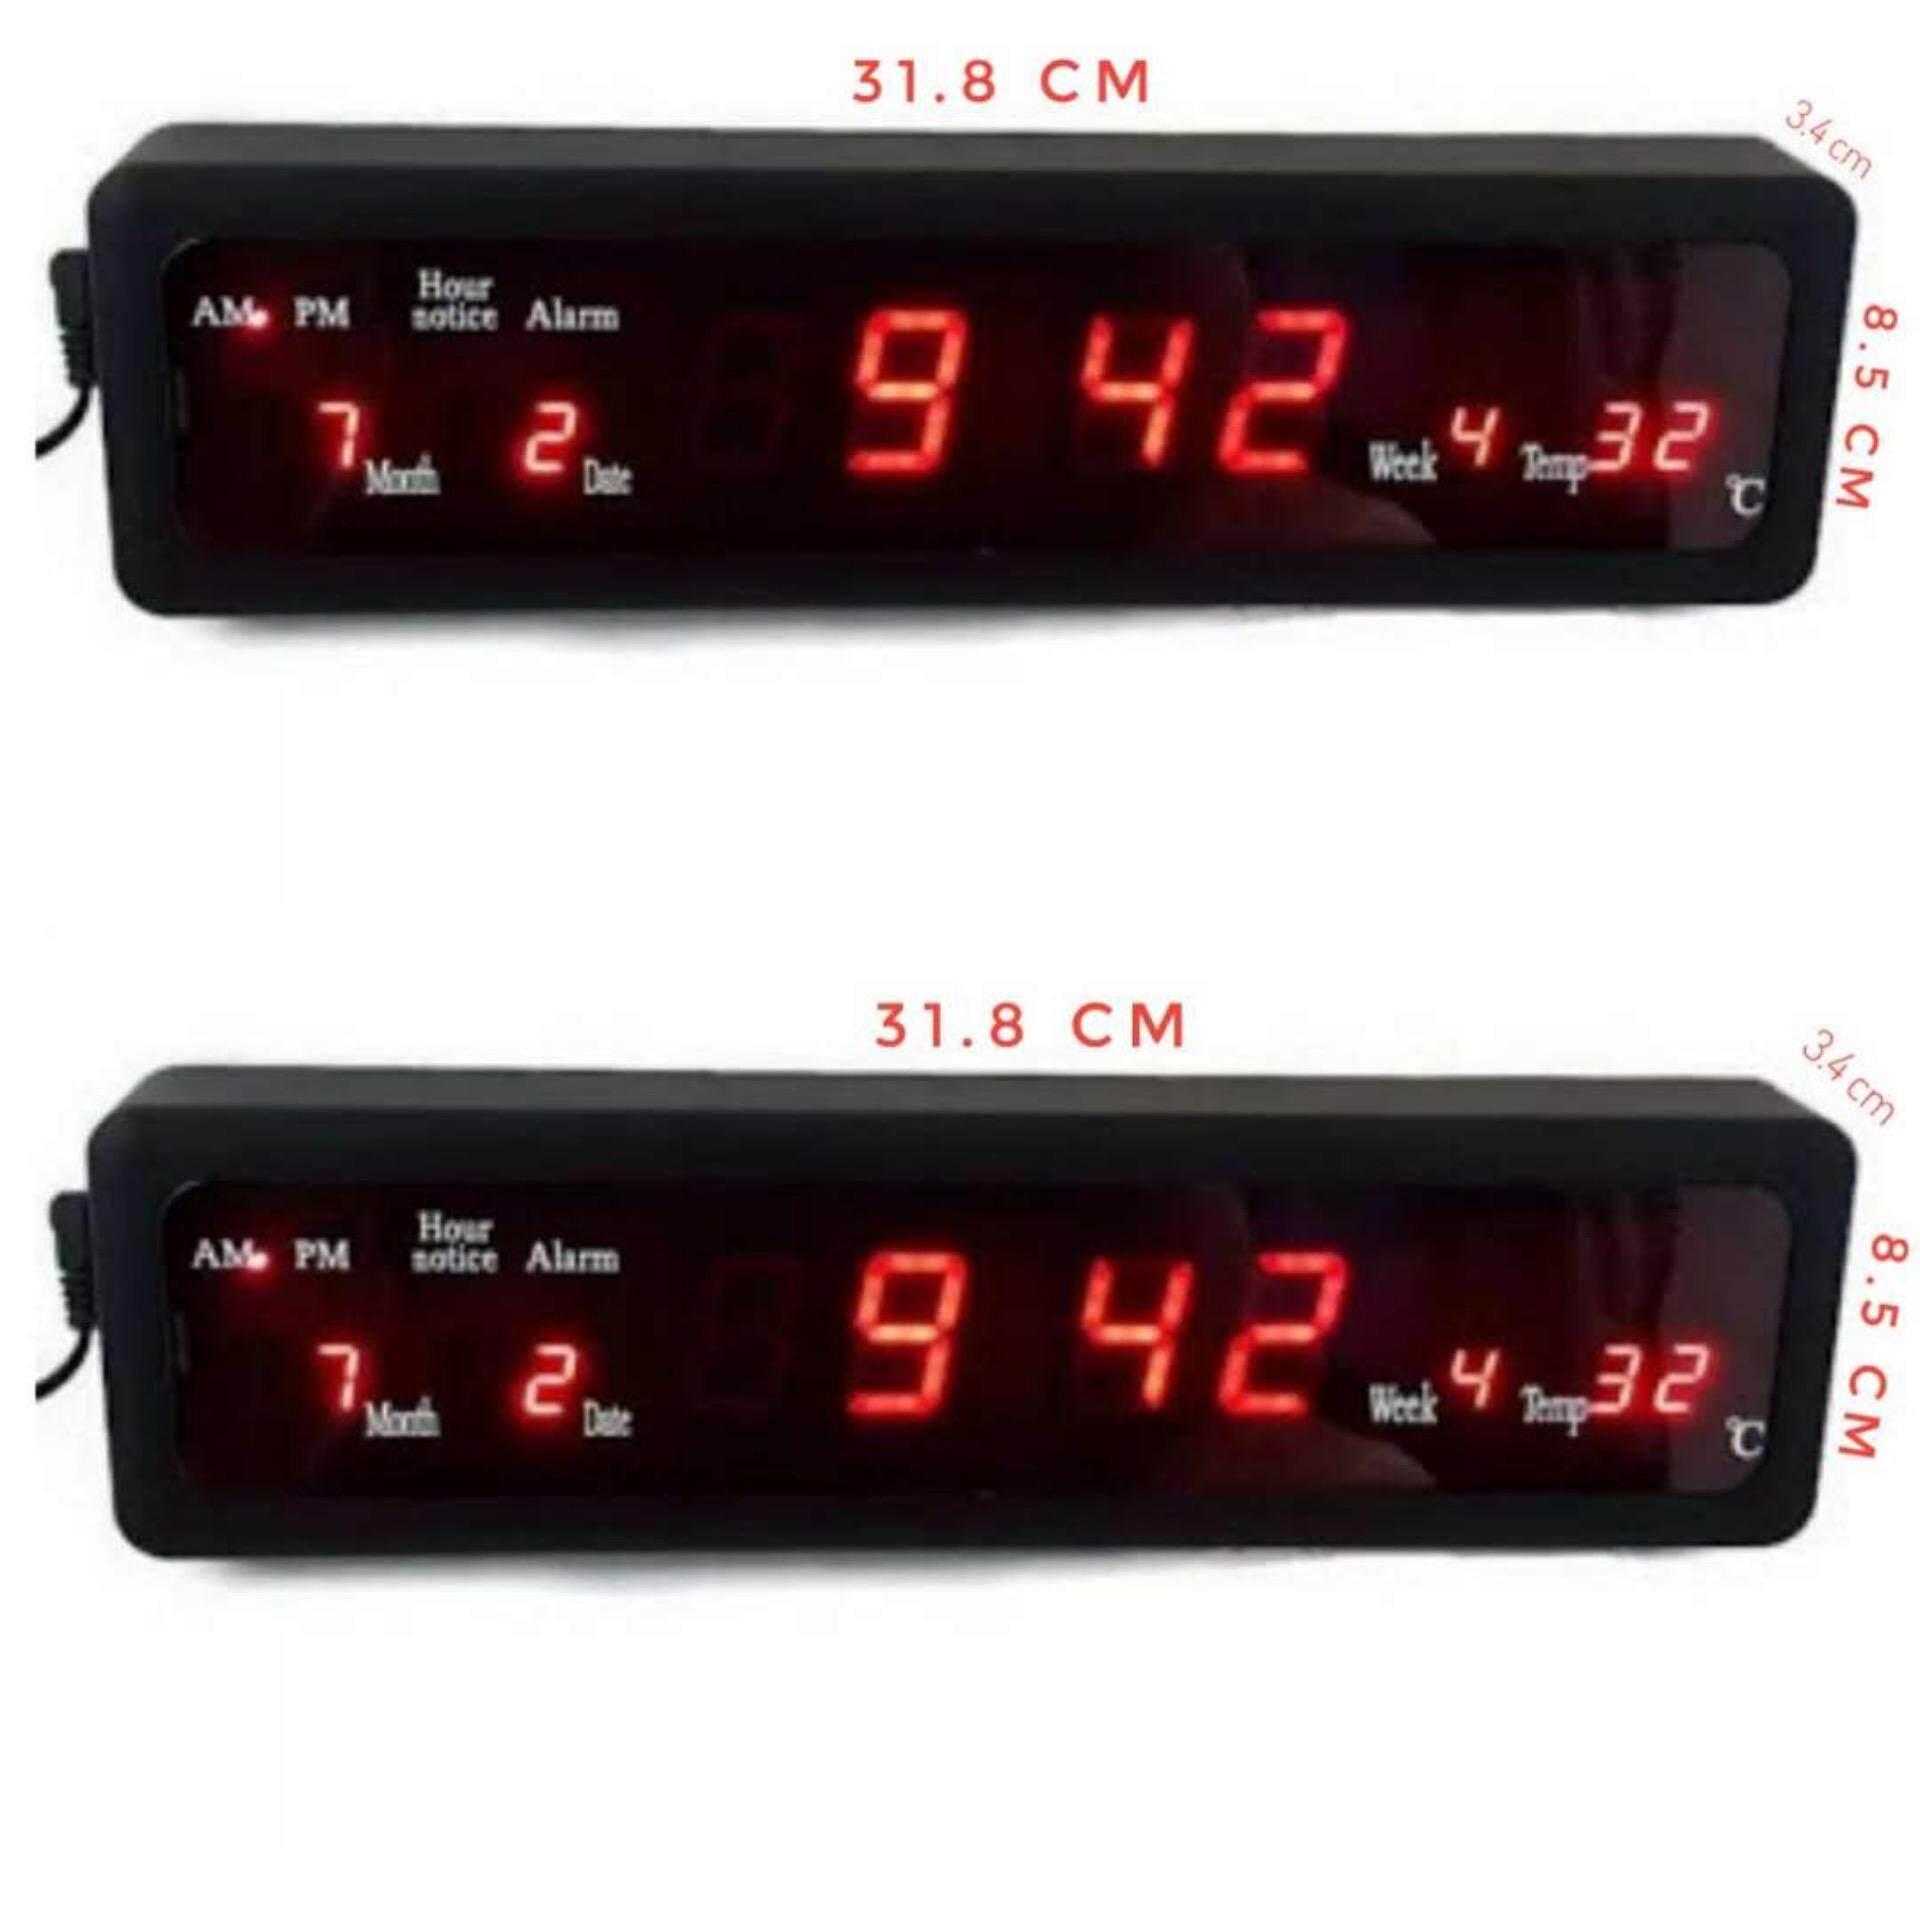 Caixing นาฬิกาดิจิตอล รุ่น Cx 808 ตัวเลขสีแดง Caixing ถูก ใน กรุงเทพมหานคร